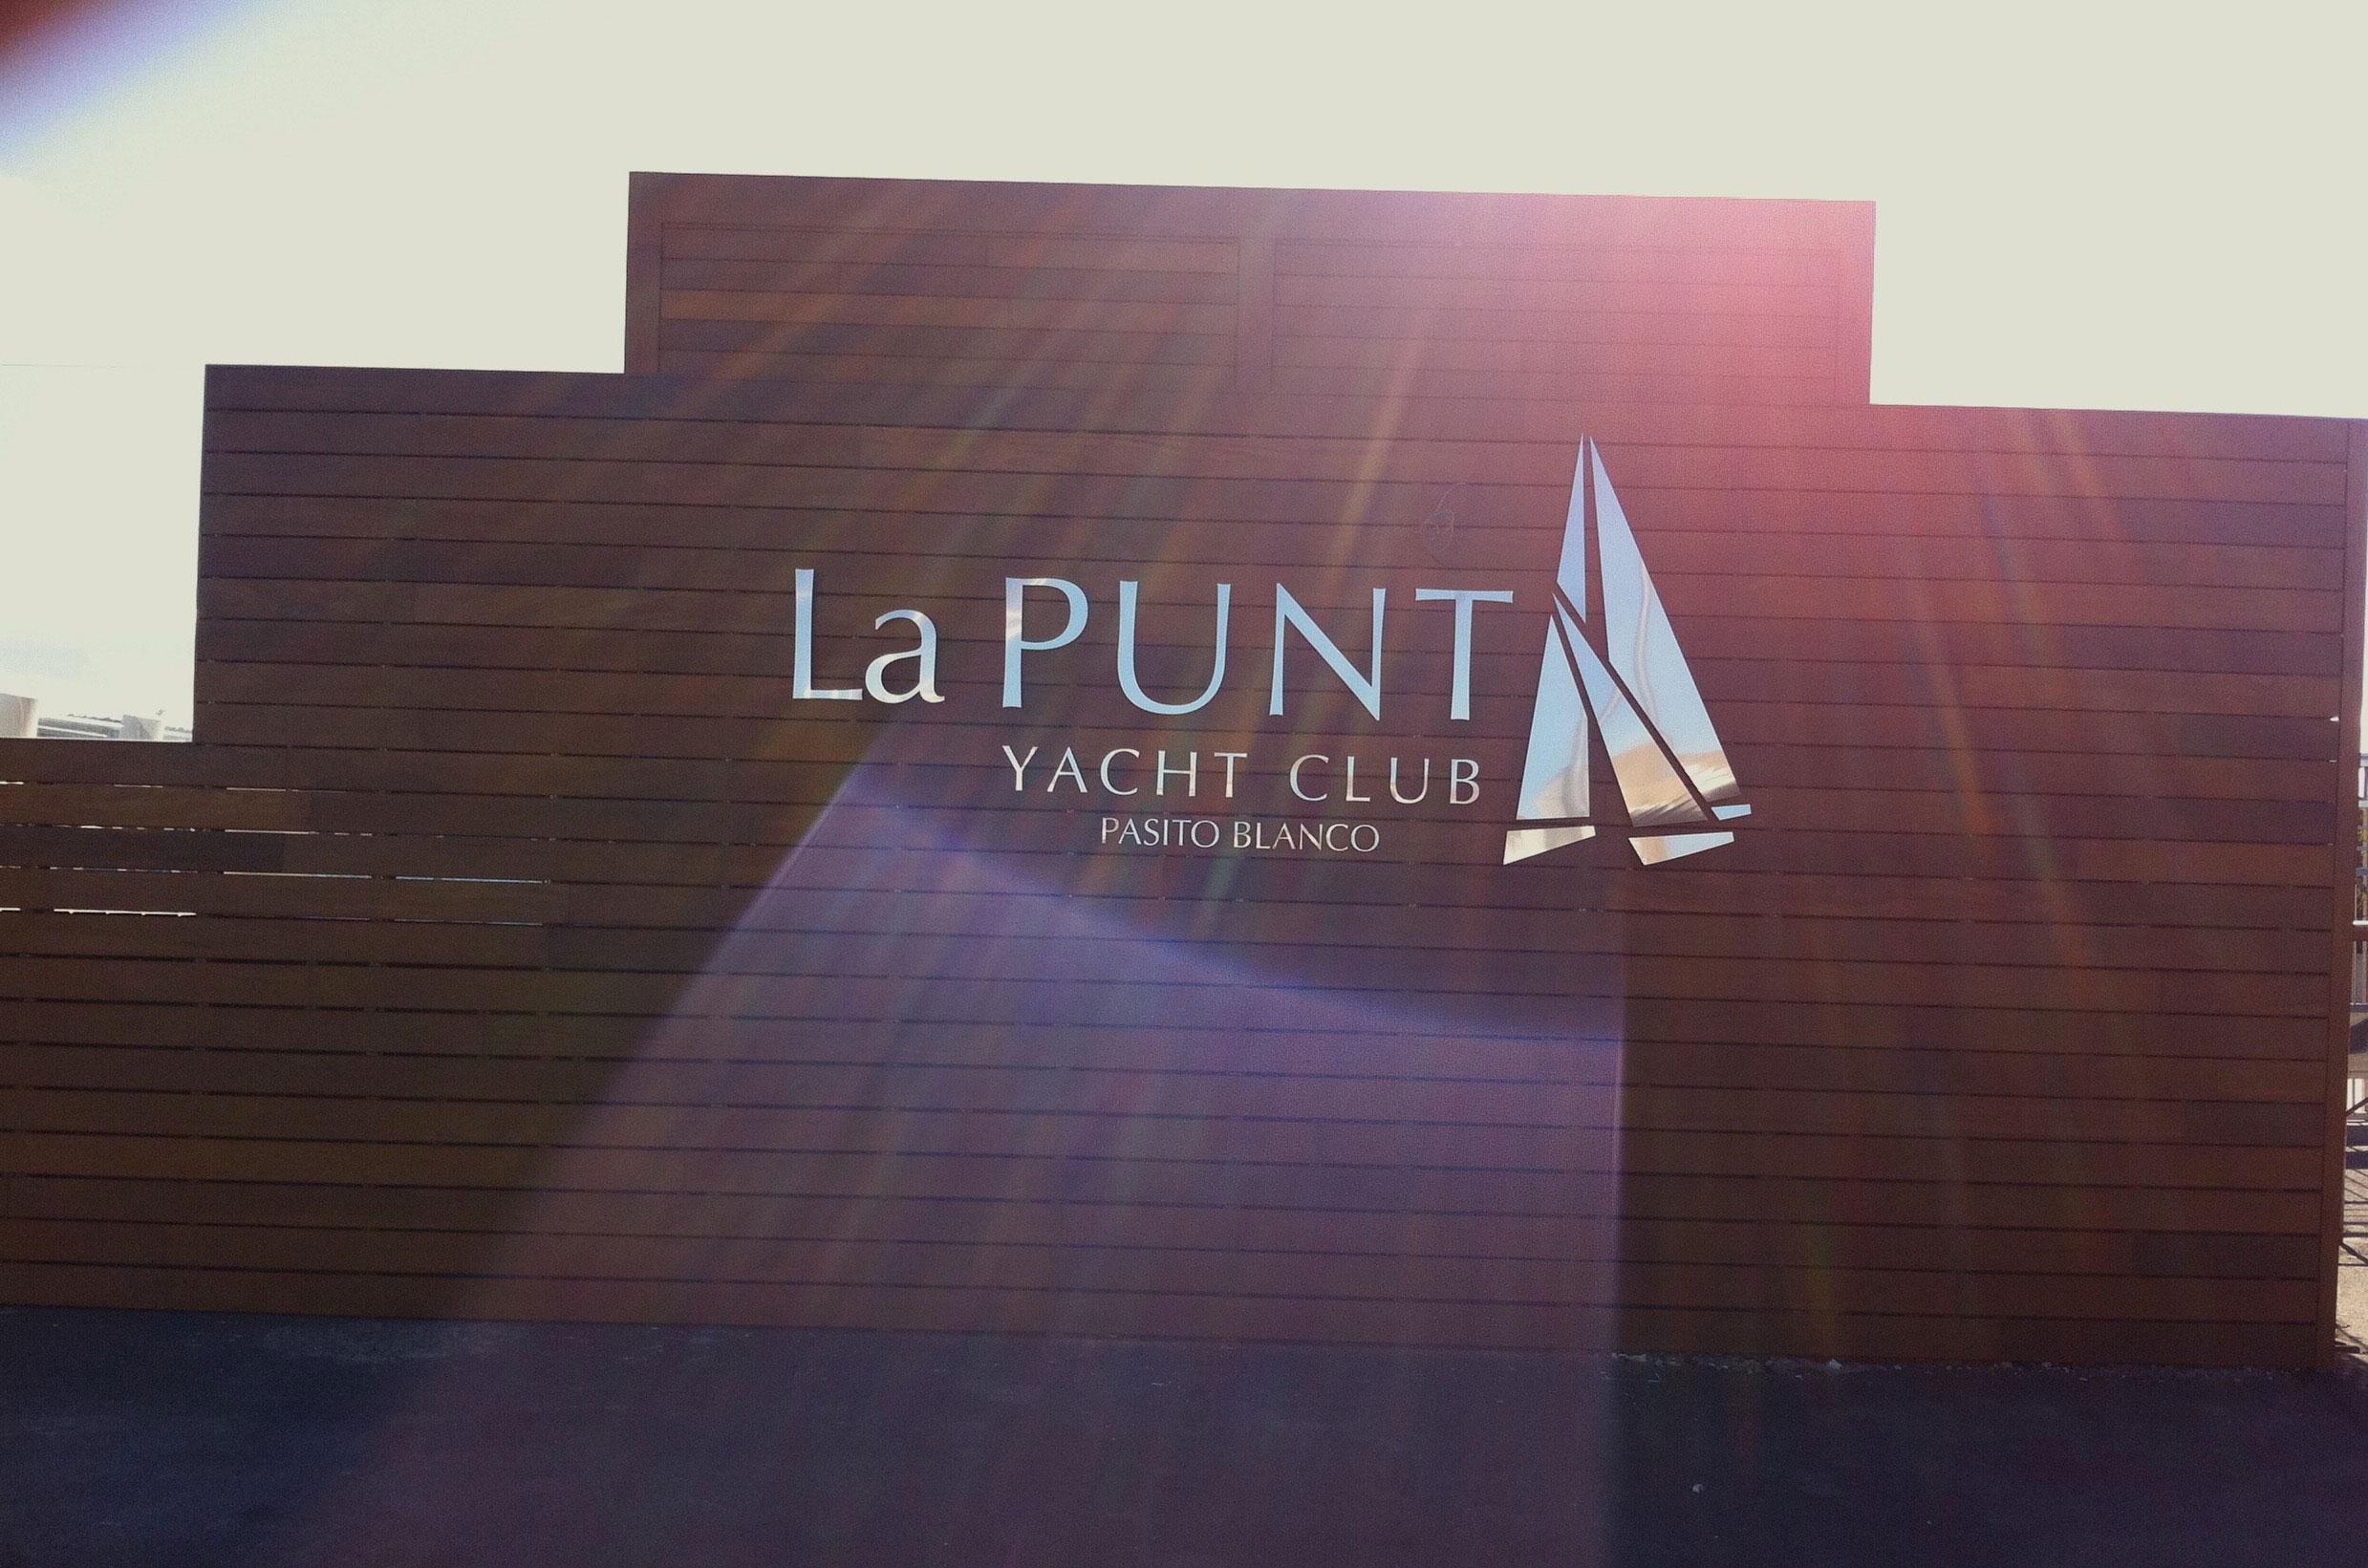 Kai Proyectos. Yach Club La Punta